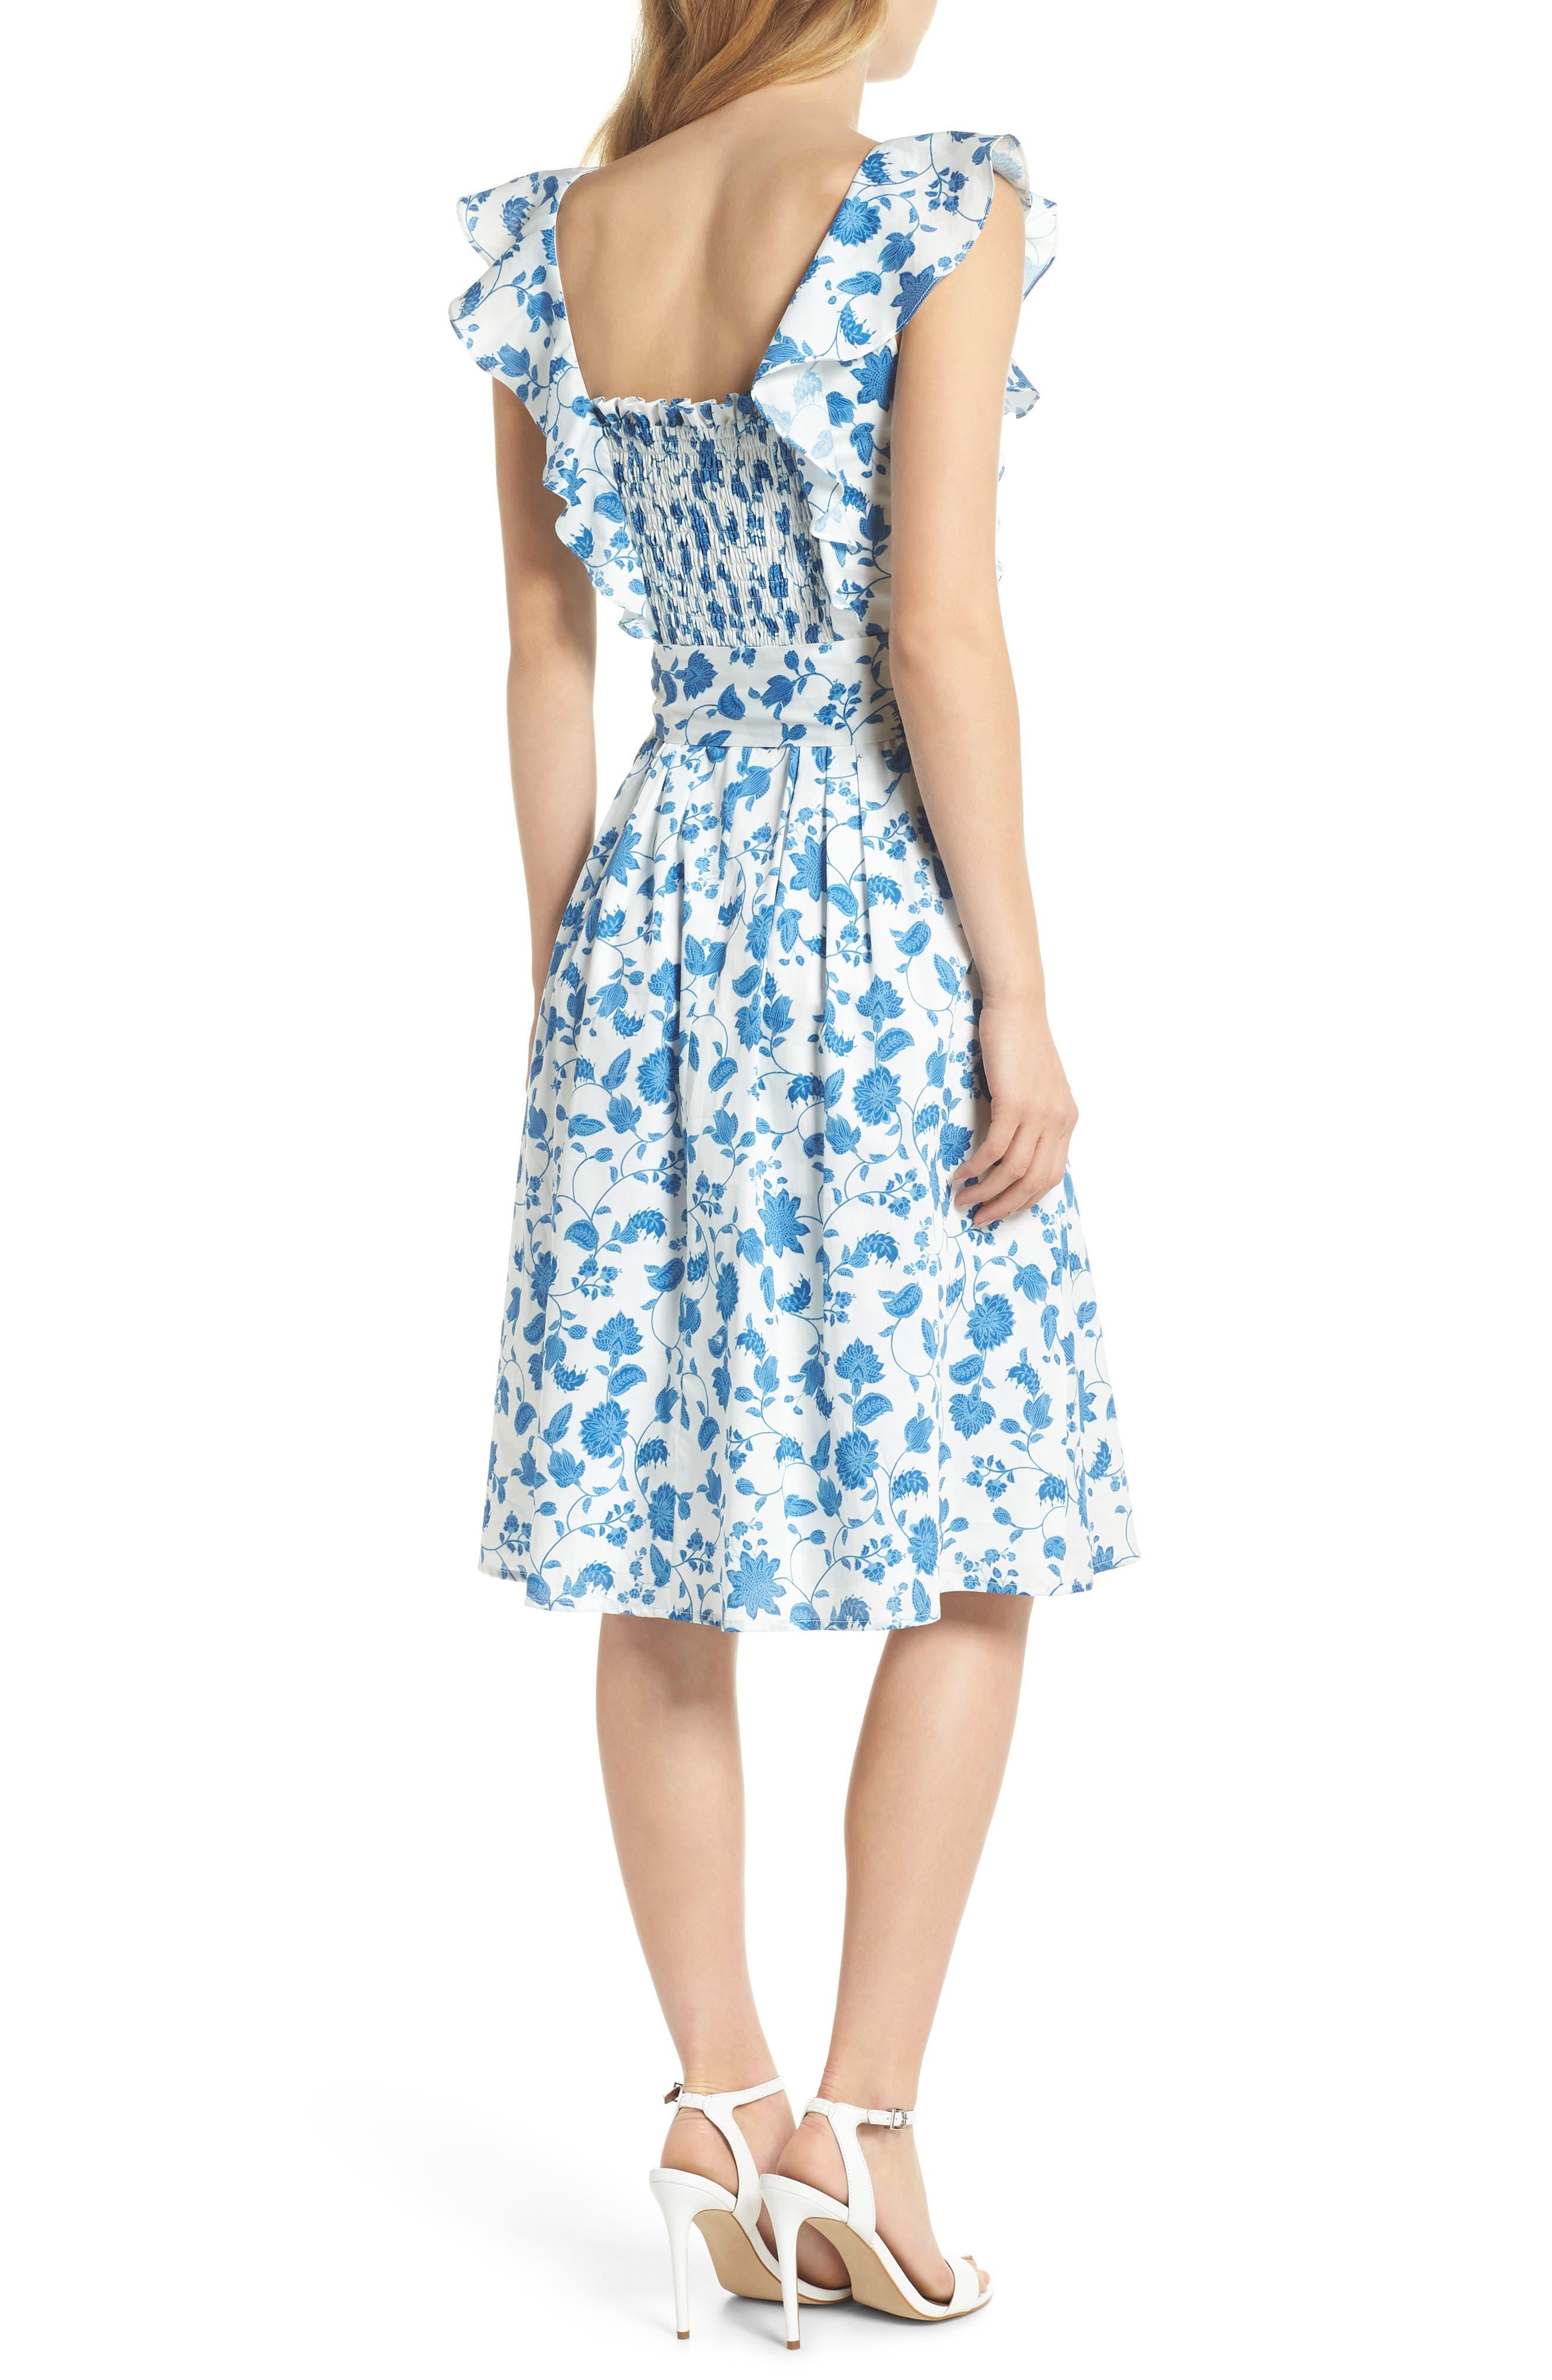 Olivia Floral Wallpaper Print Fit & Flare Dress,                             Alternate thumbnail 3, color,                             Cloud/ Blue